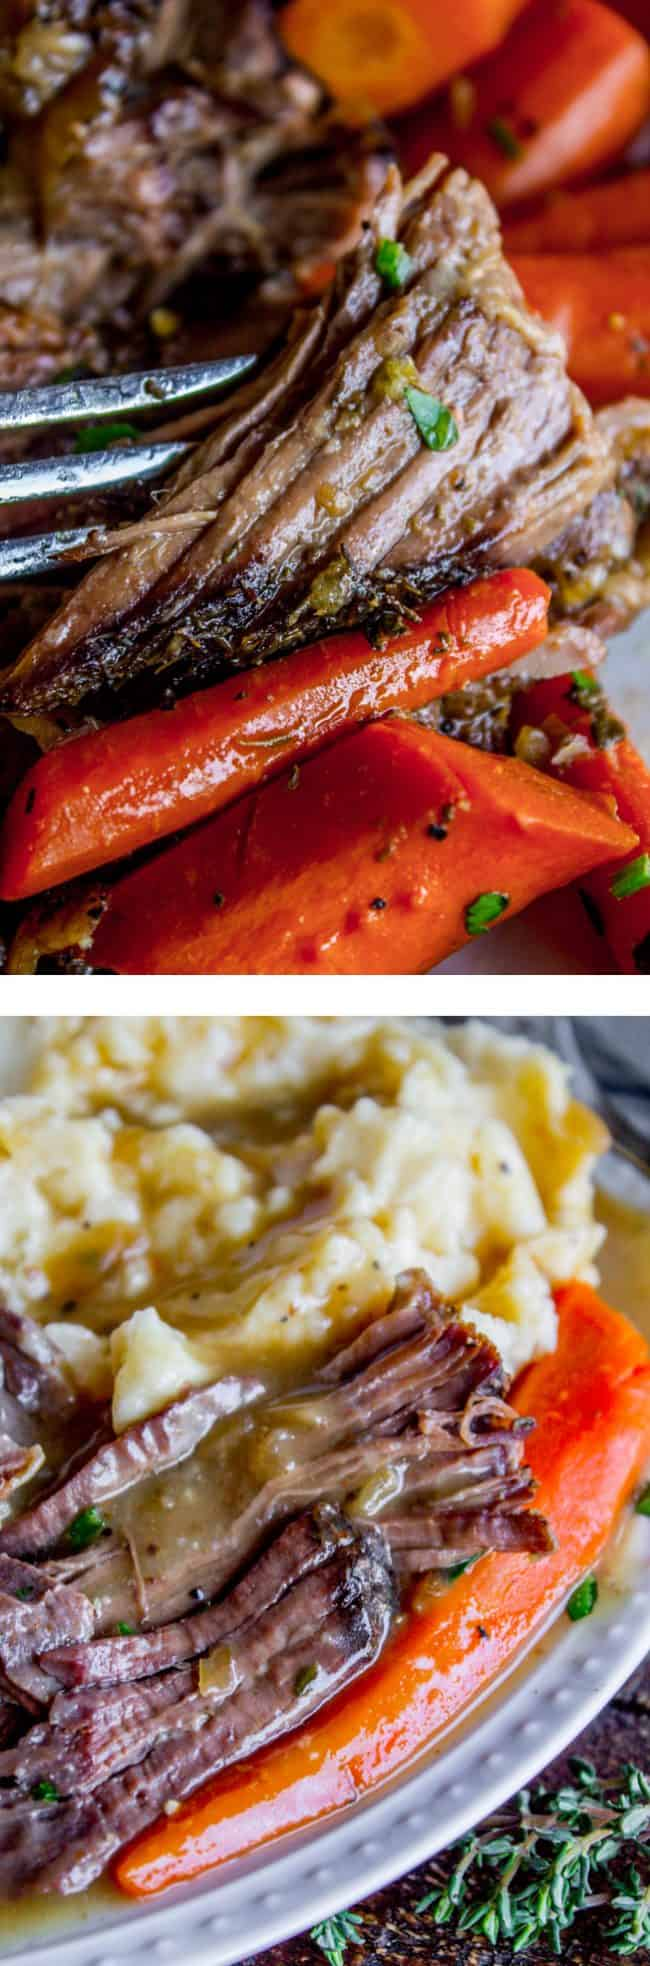 Pot roast crock pot with carrots and mashed potatoes